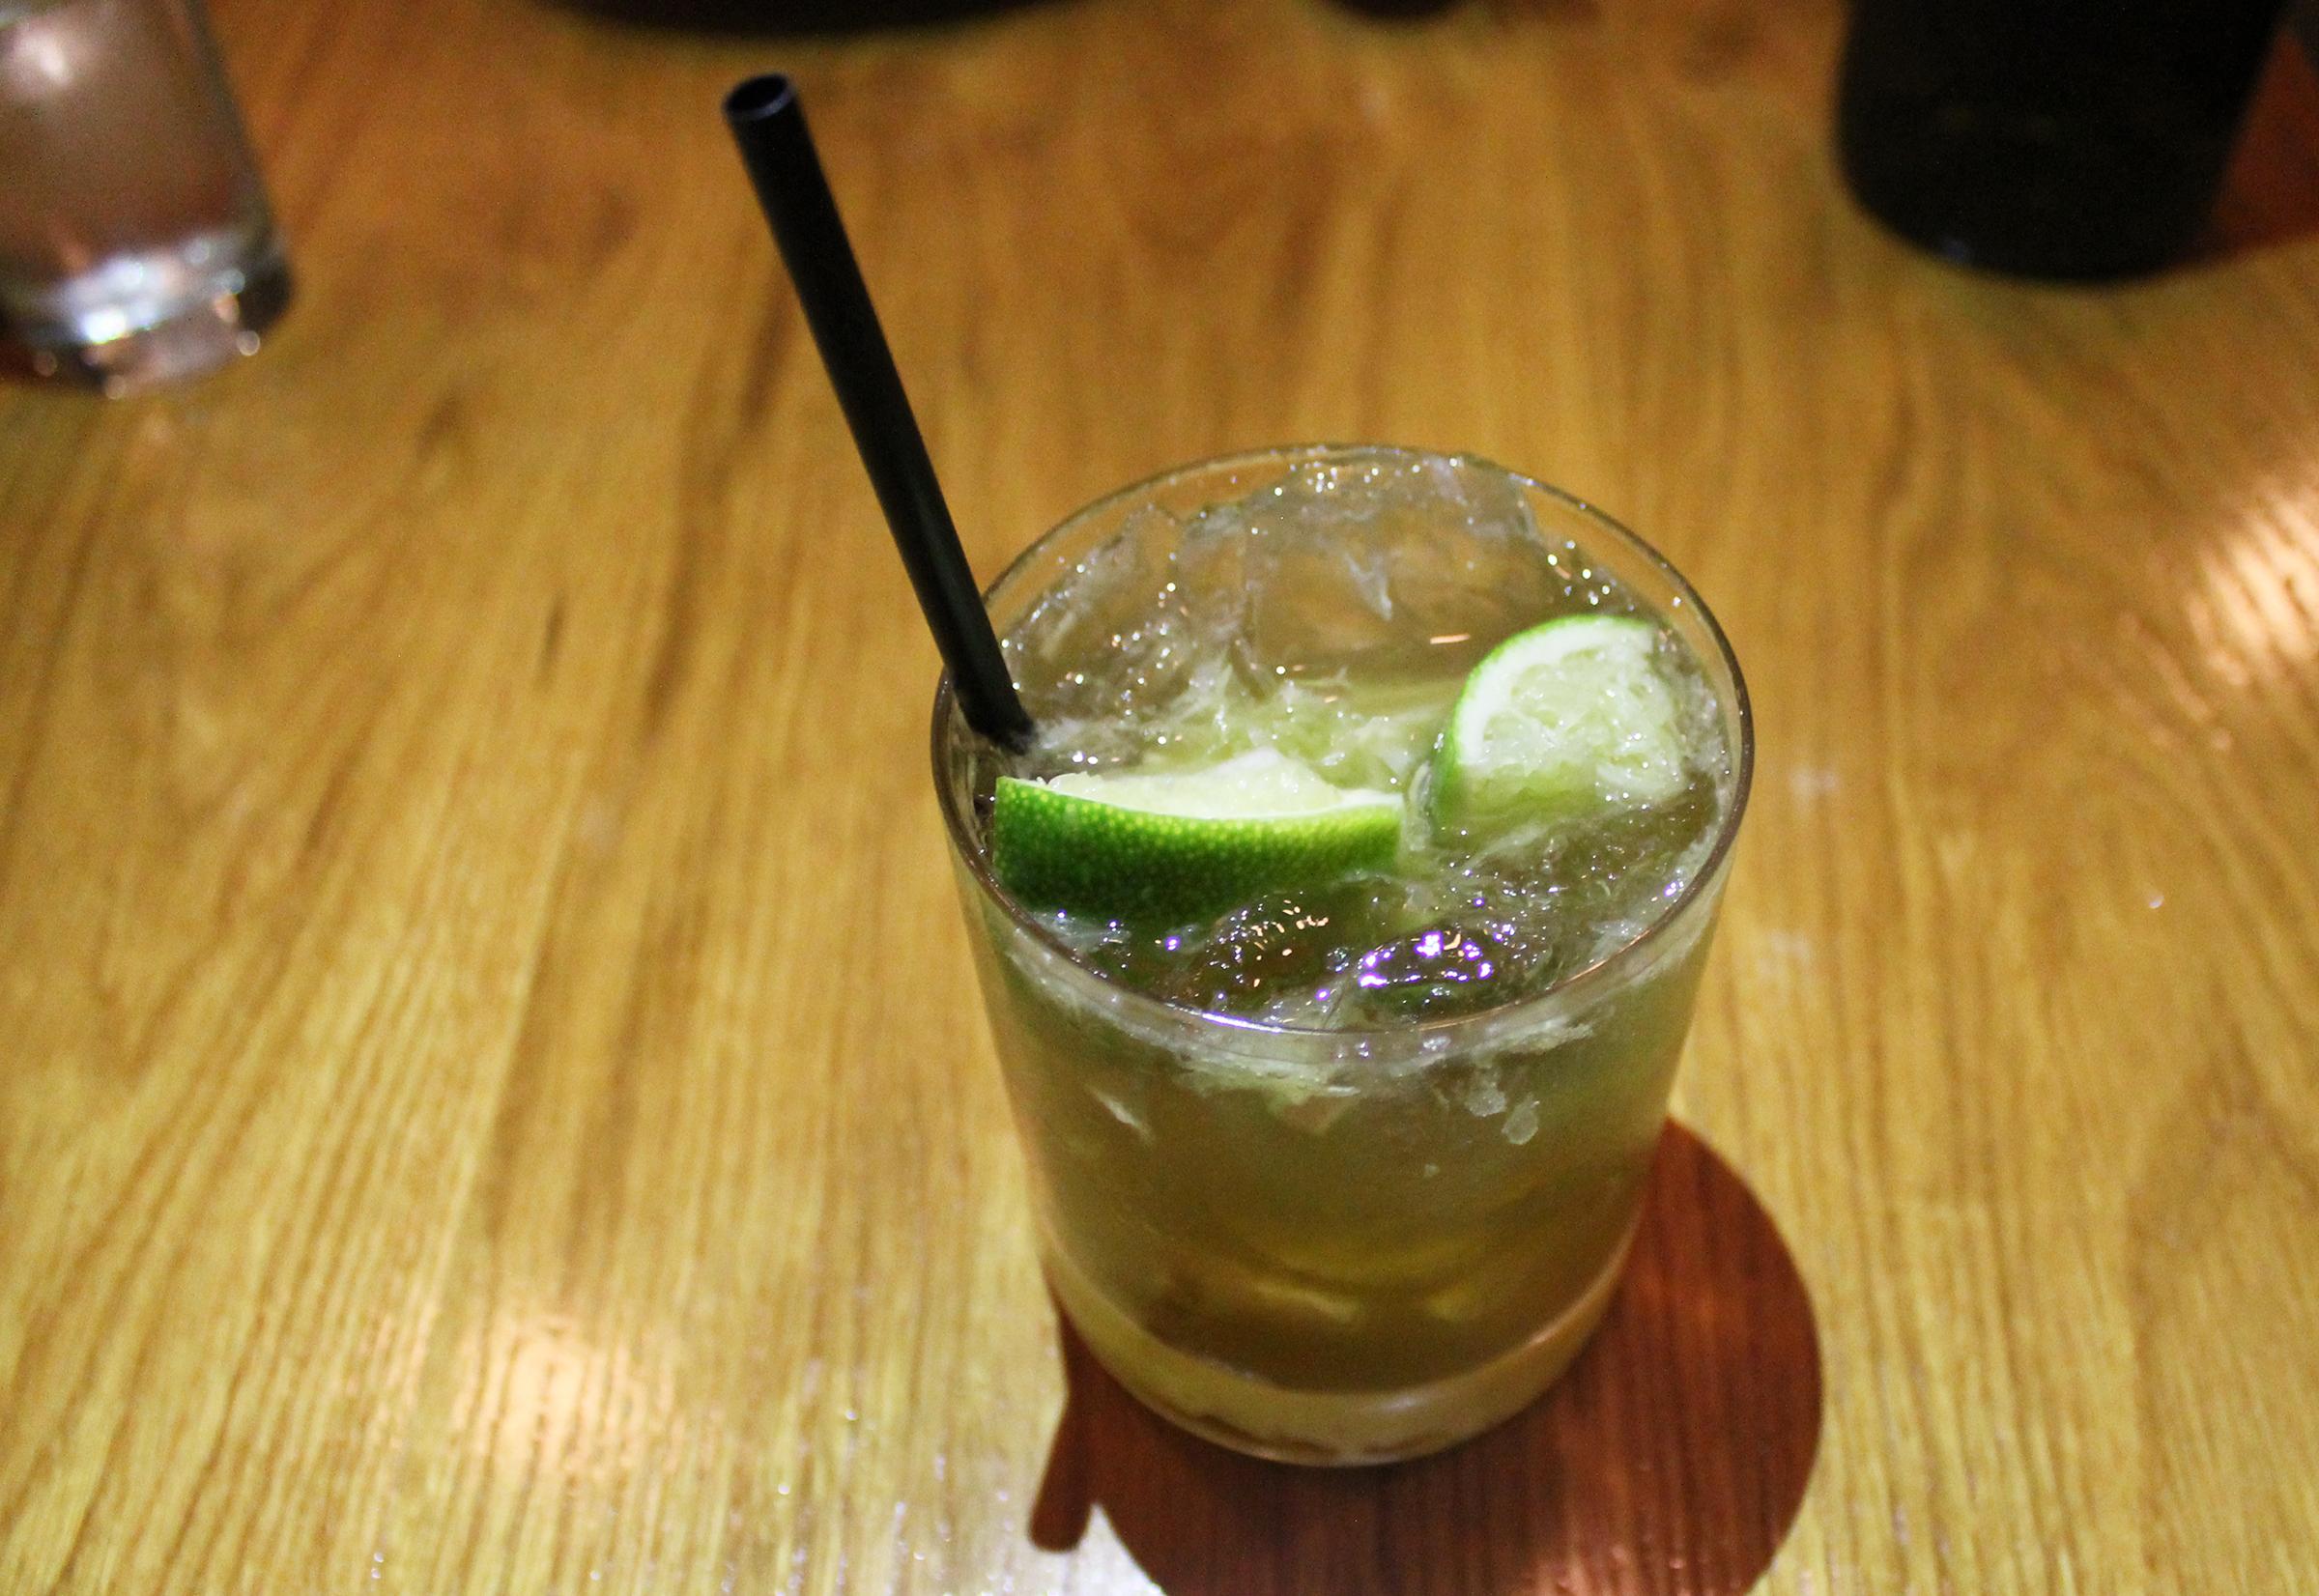 Jade of Hearts: Loft & Bear Vodka, Cocchi Rosa, Lime, Thai Basil Syrup, Lemongrass, Salt